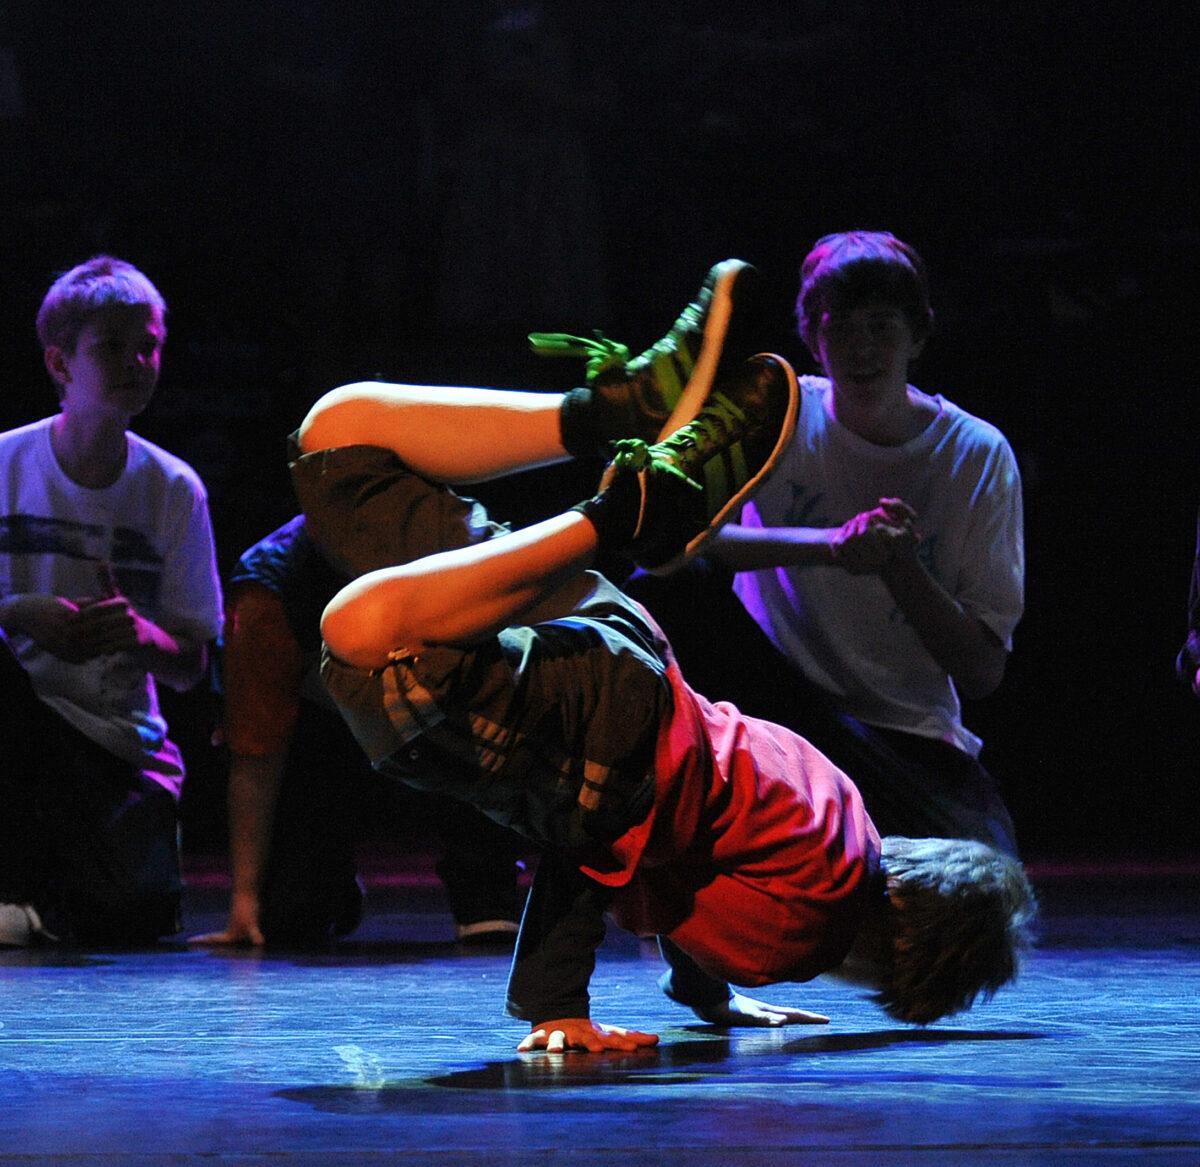 pokaz grupy breakdance